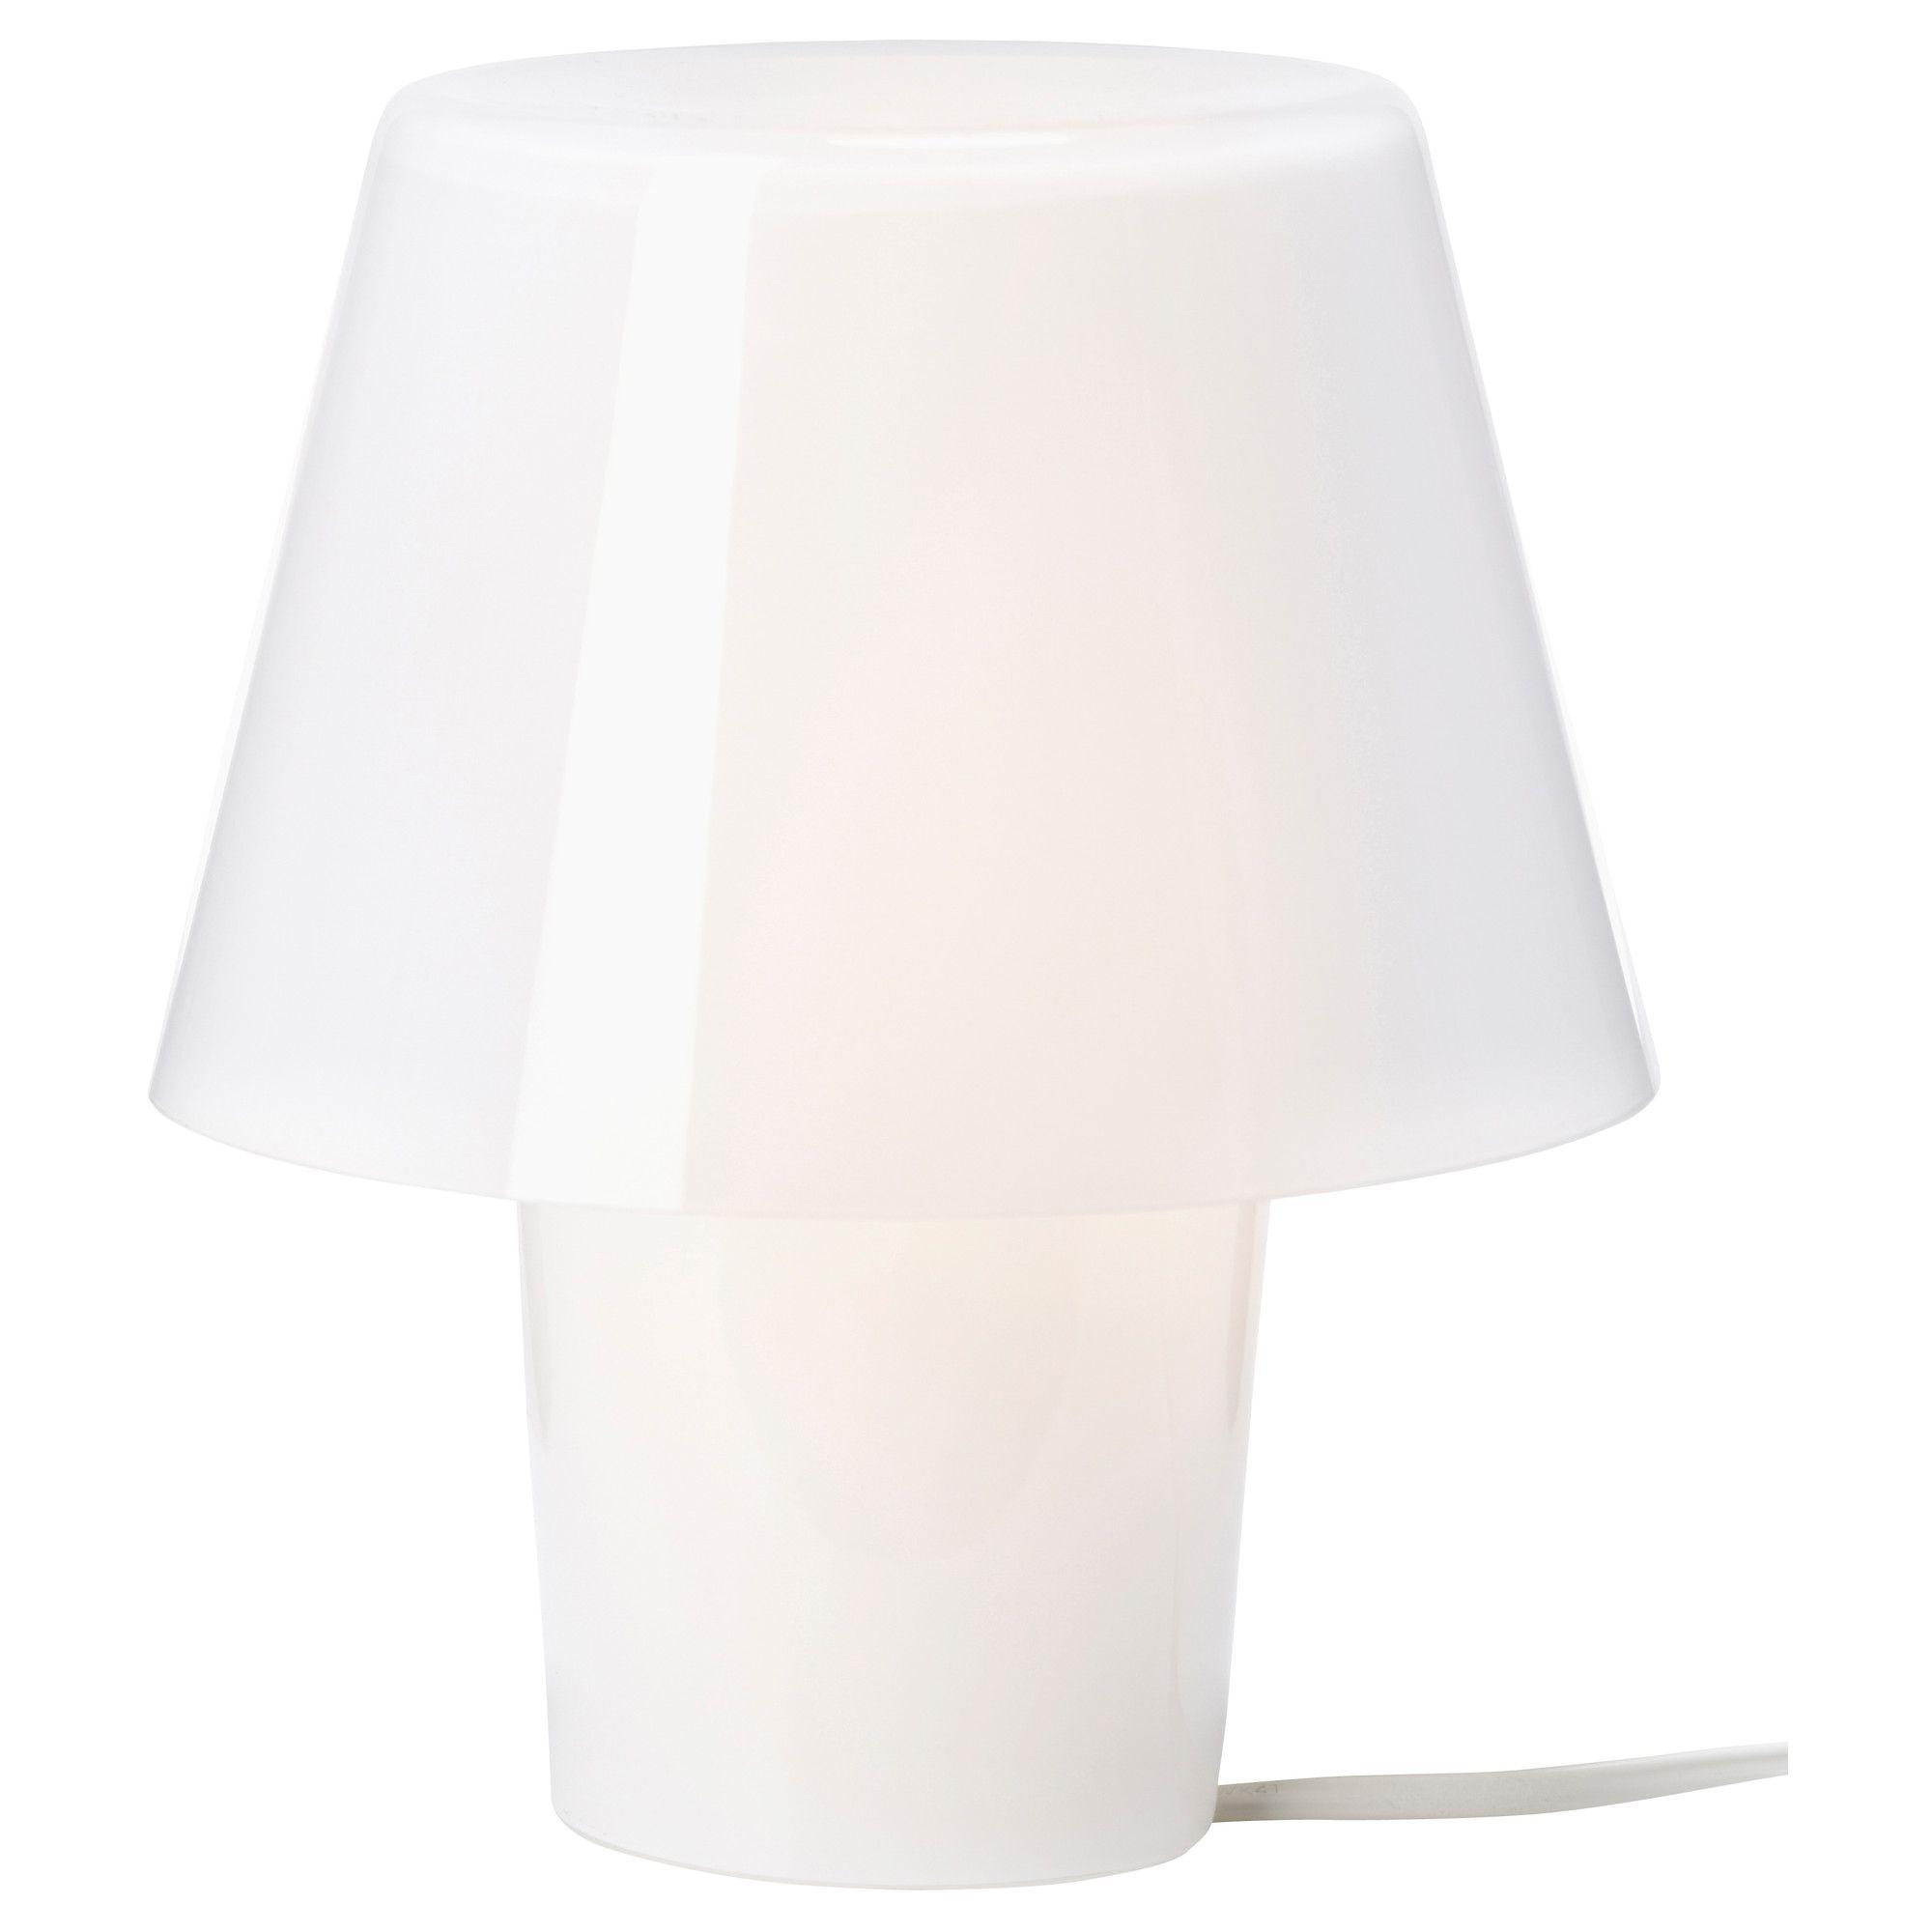 Lampe De Chevet Ikea Led Creapach